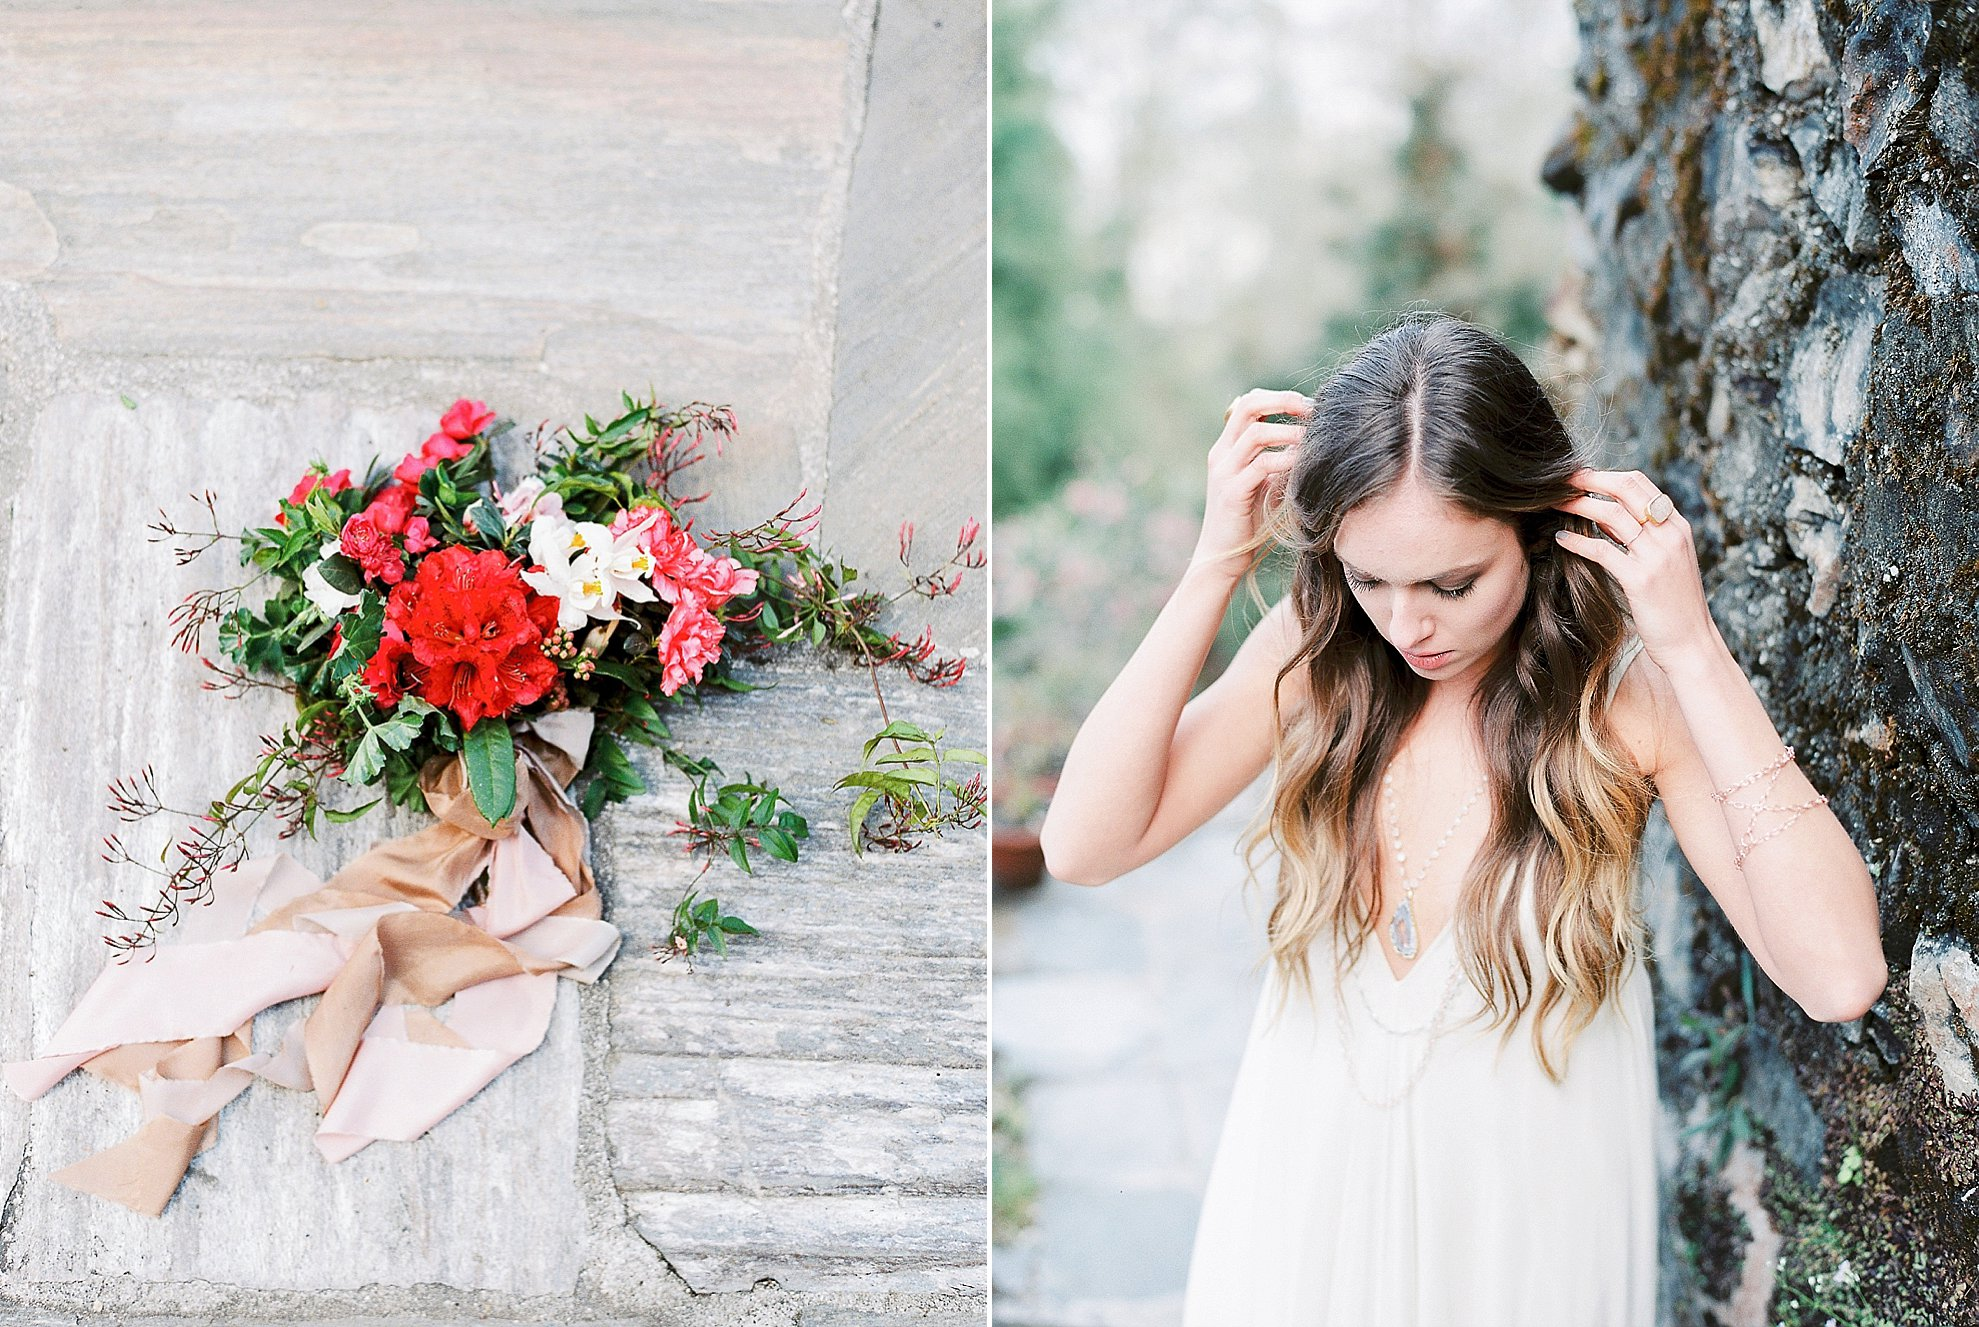 Bianca-Rijkenbarg-fotografie-for-this-romance-bruidsinspiratie-blog_0015